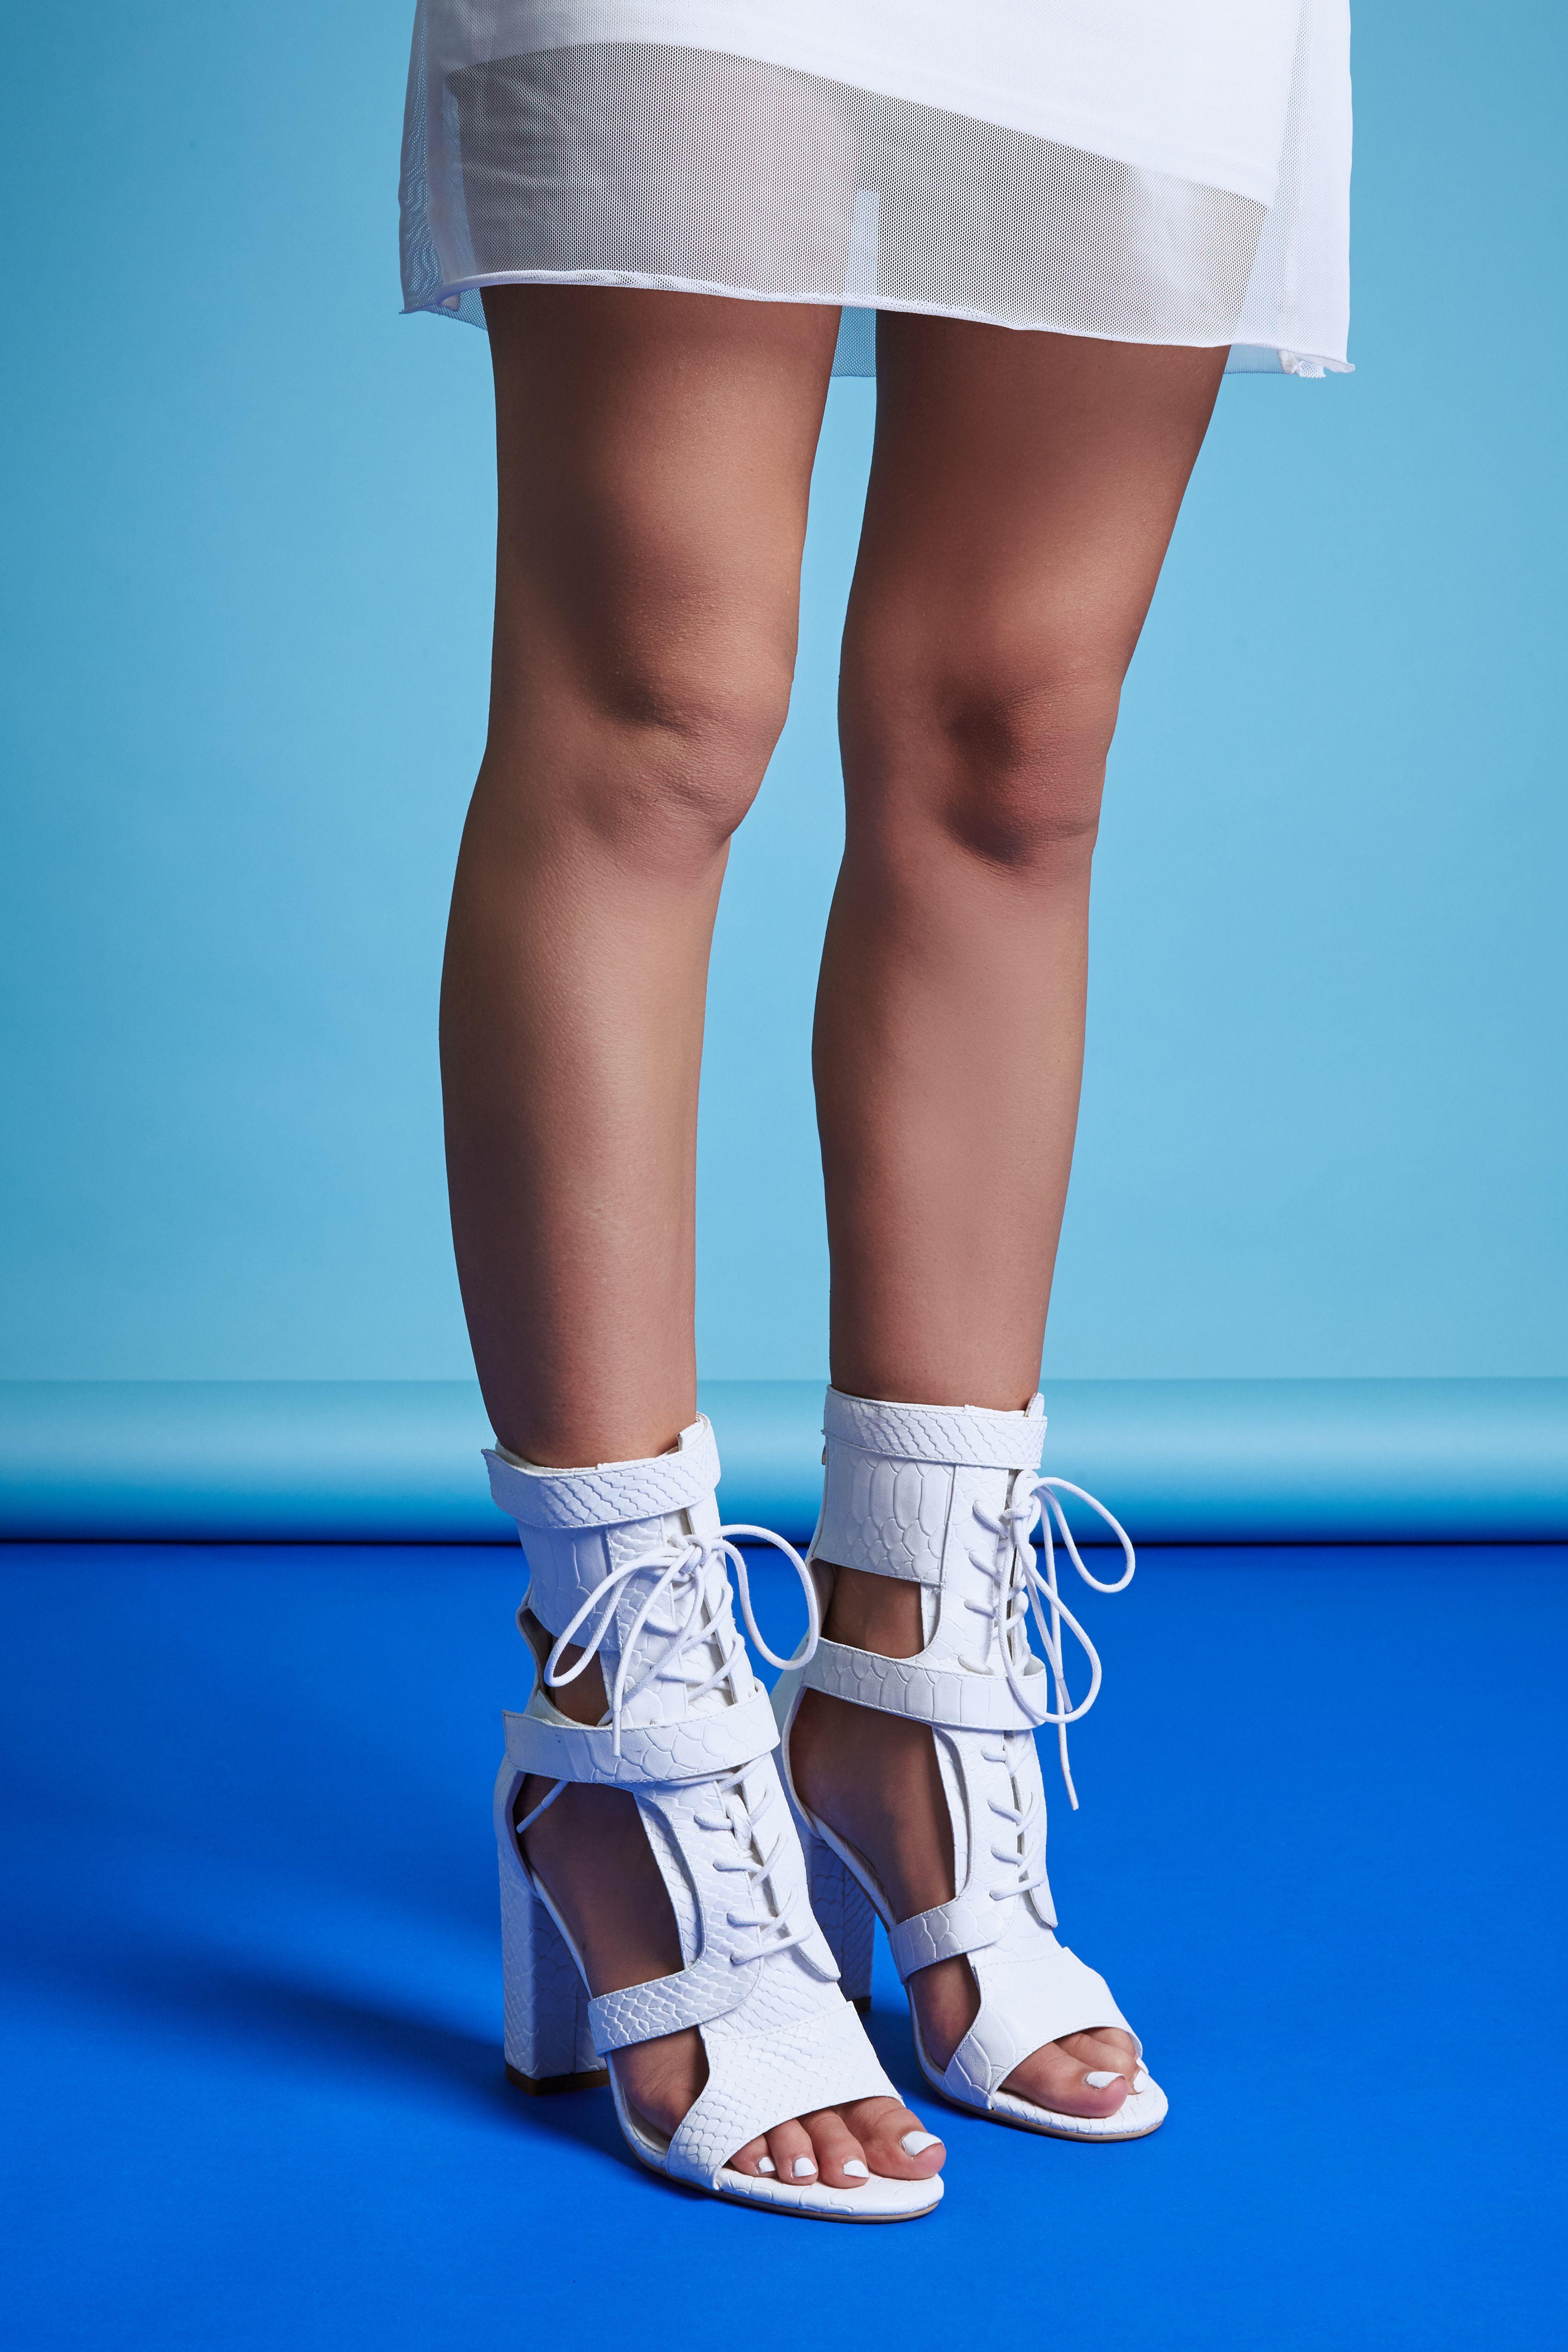 c555a566481 Khloe white snake print cut out lace up boots. Studio shoe photography!  Shop online